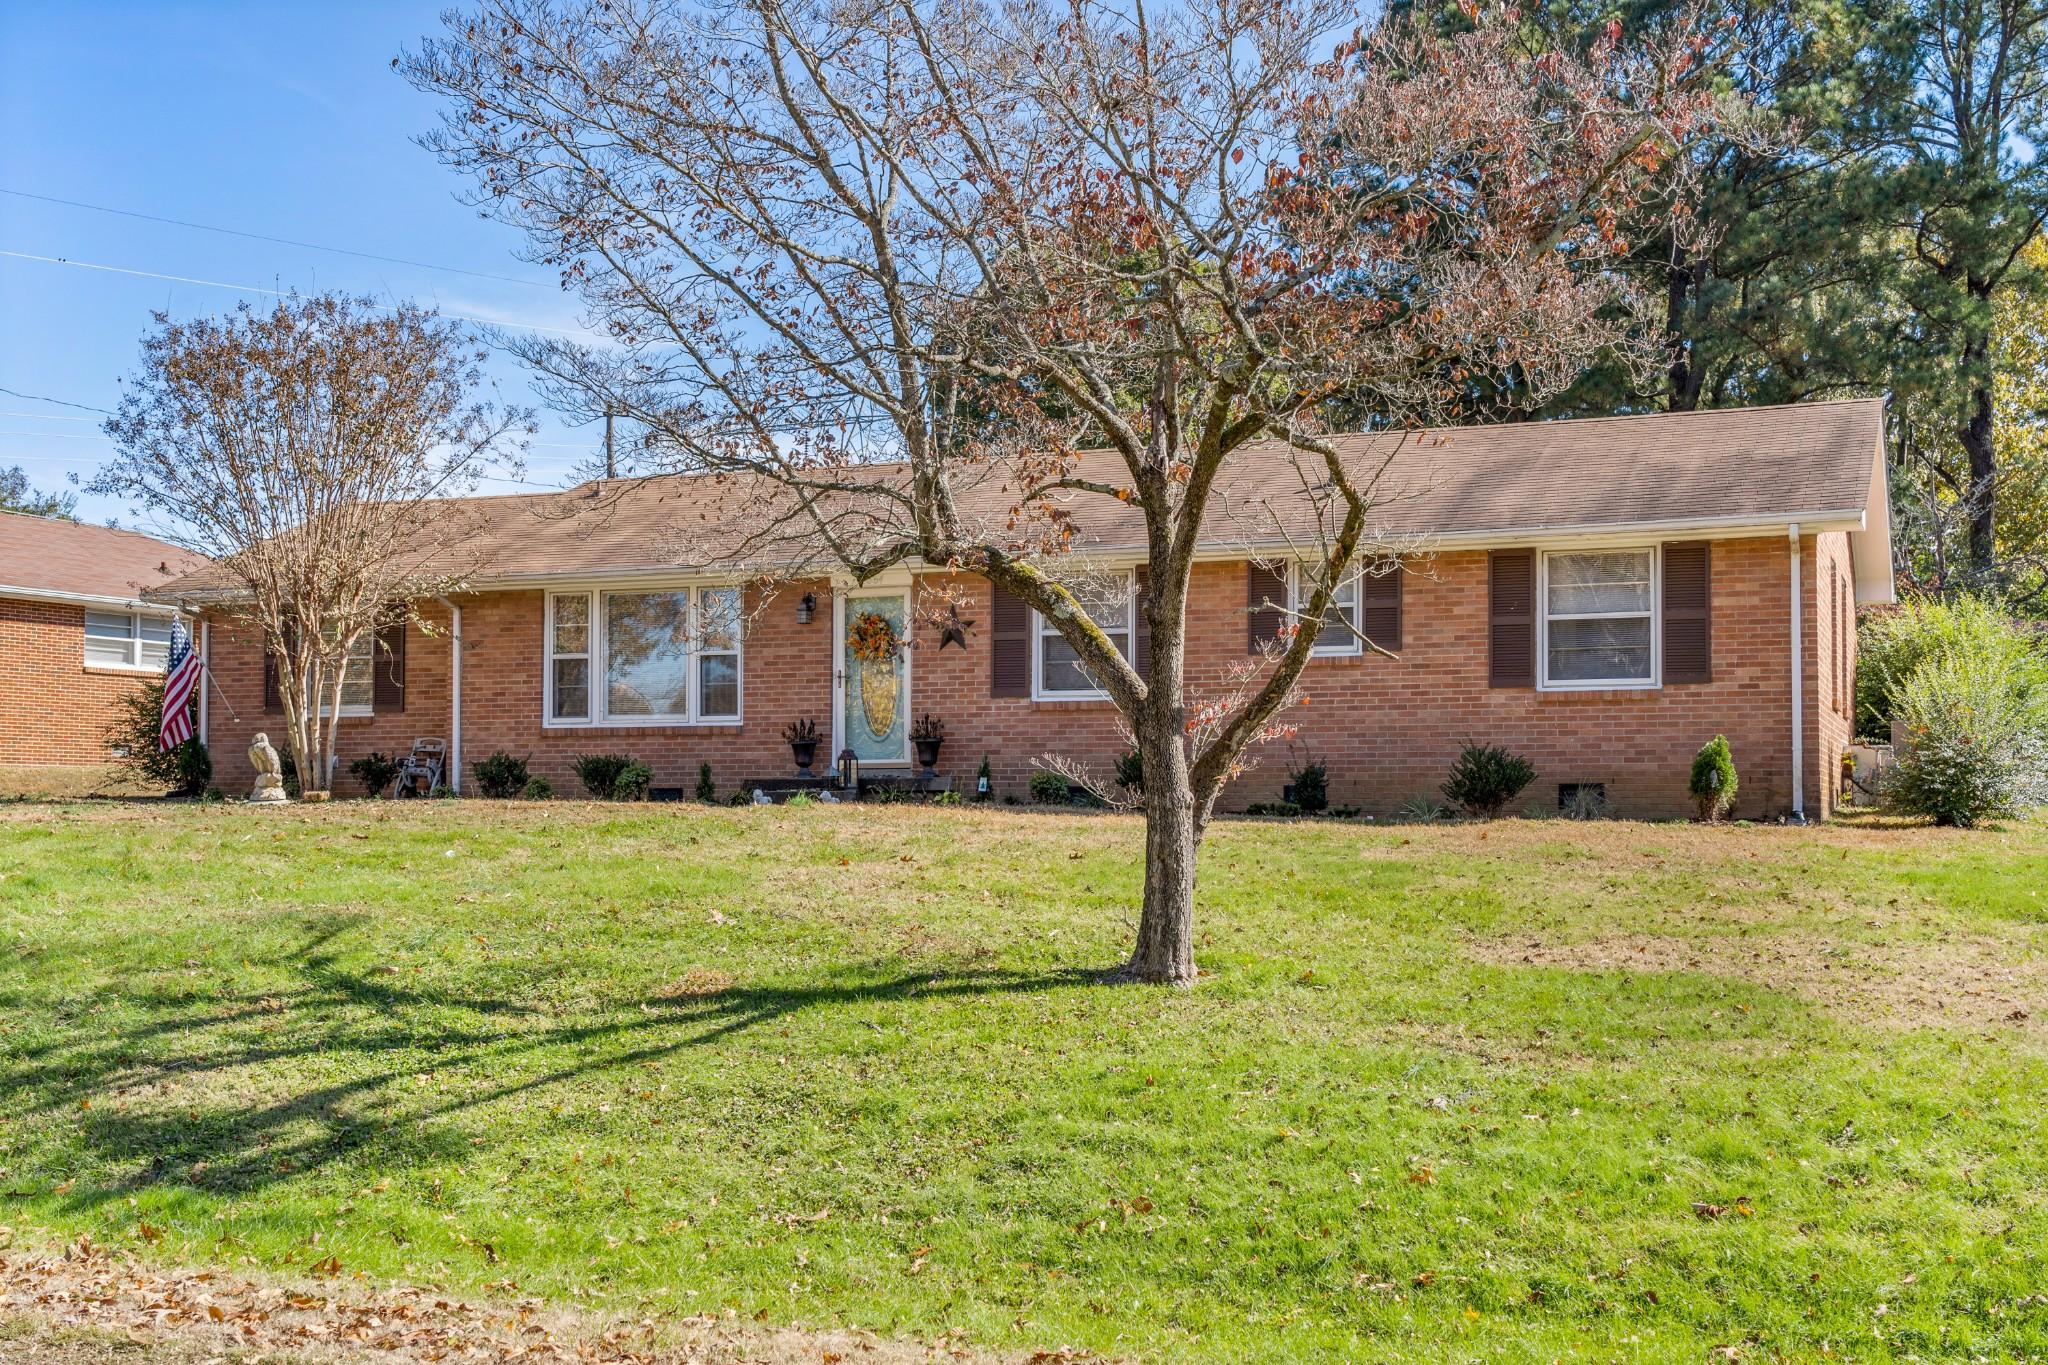 2084 Landon Rd, Clarksville, TN 37043 - Clarksville, TN real estate listing